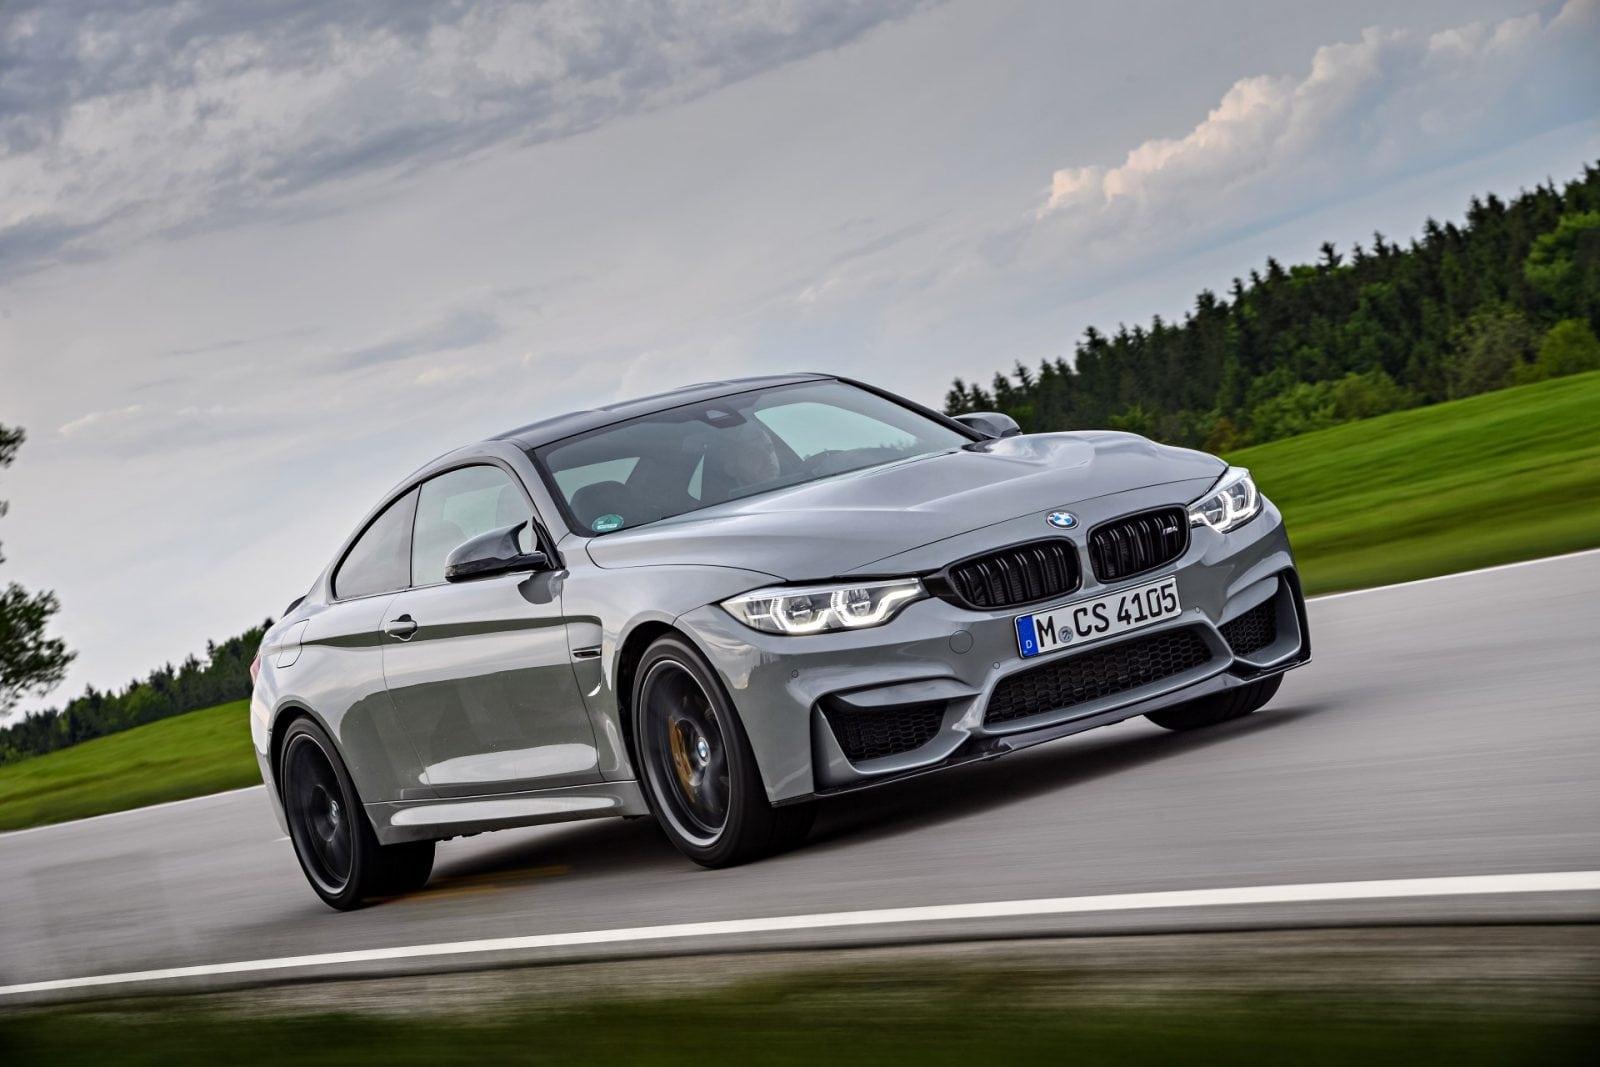 BMW M4 CS 2017 Lime Rock Grey Metallic